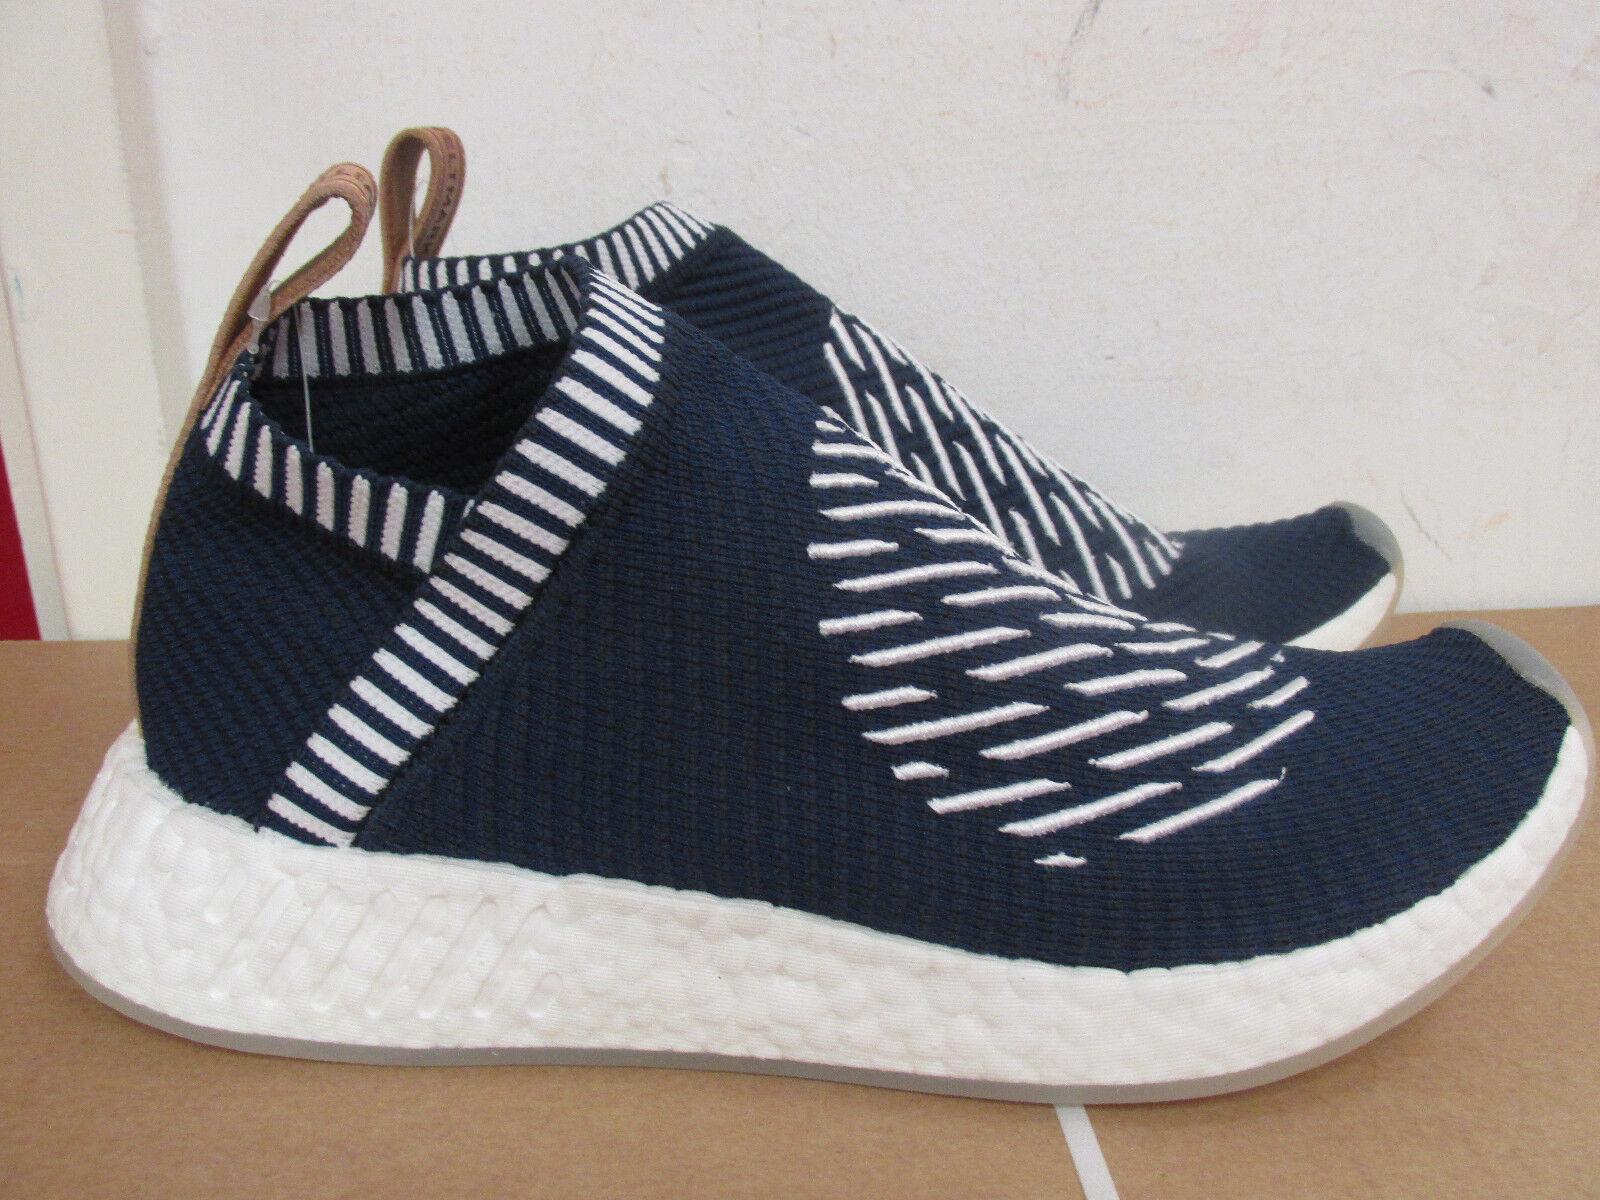 Adidas ultra impulso st m bb3930 noi taglia 9 uomini 1683a5